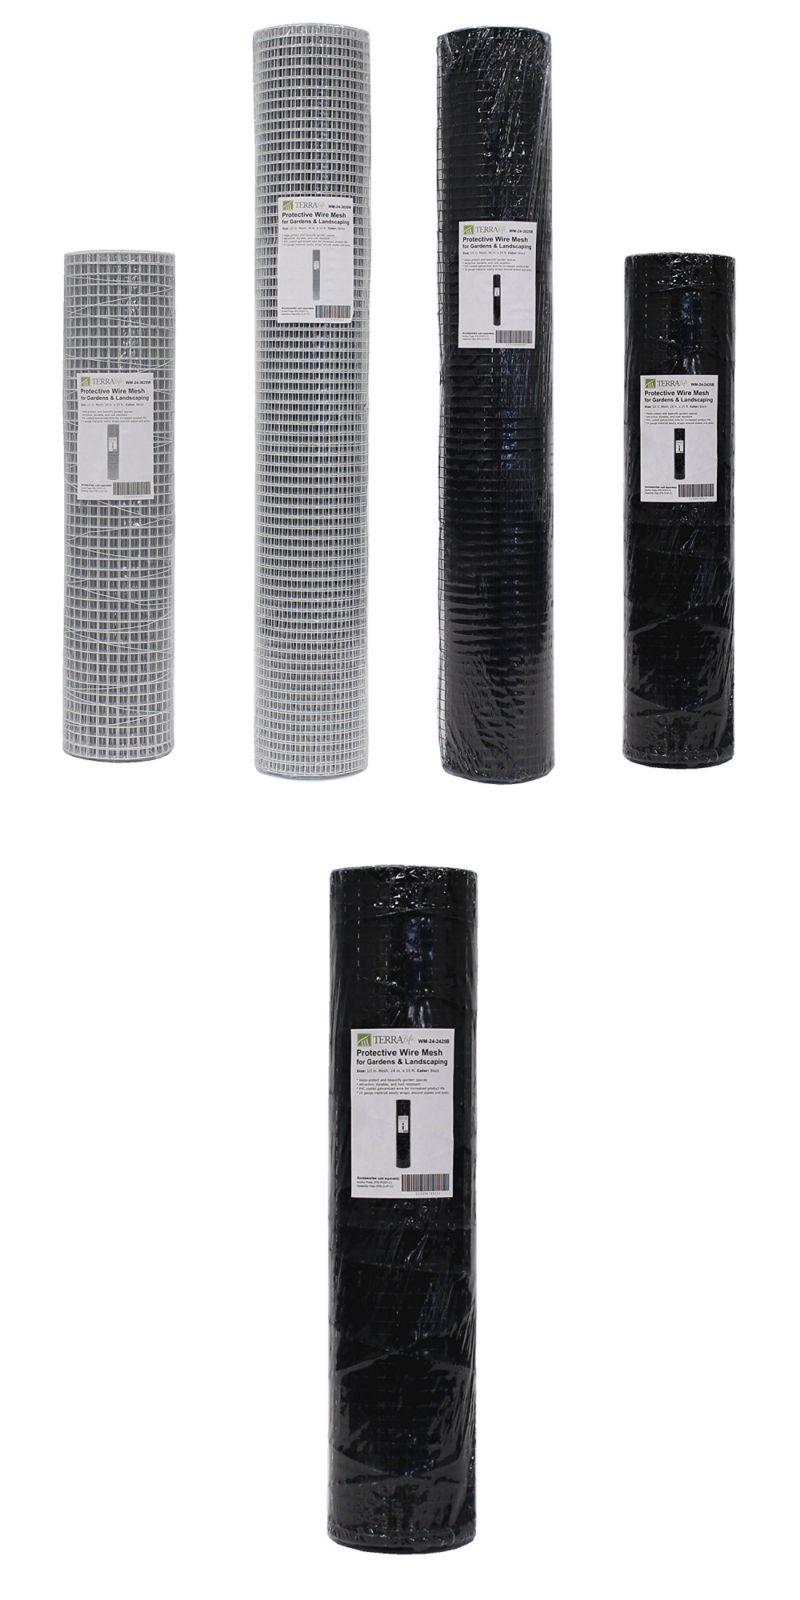 Hardware Cloth Metal Mesh 180985: Terra Life 1 2 Mesh, Wire Mesh ...